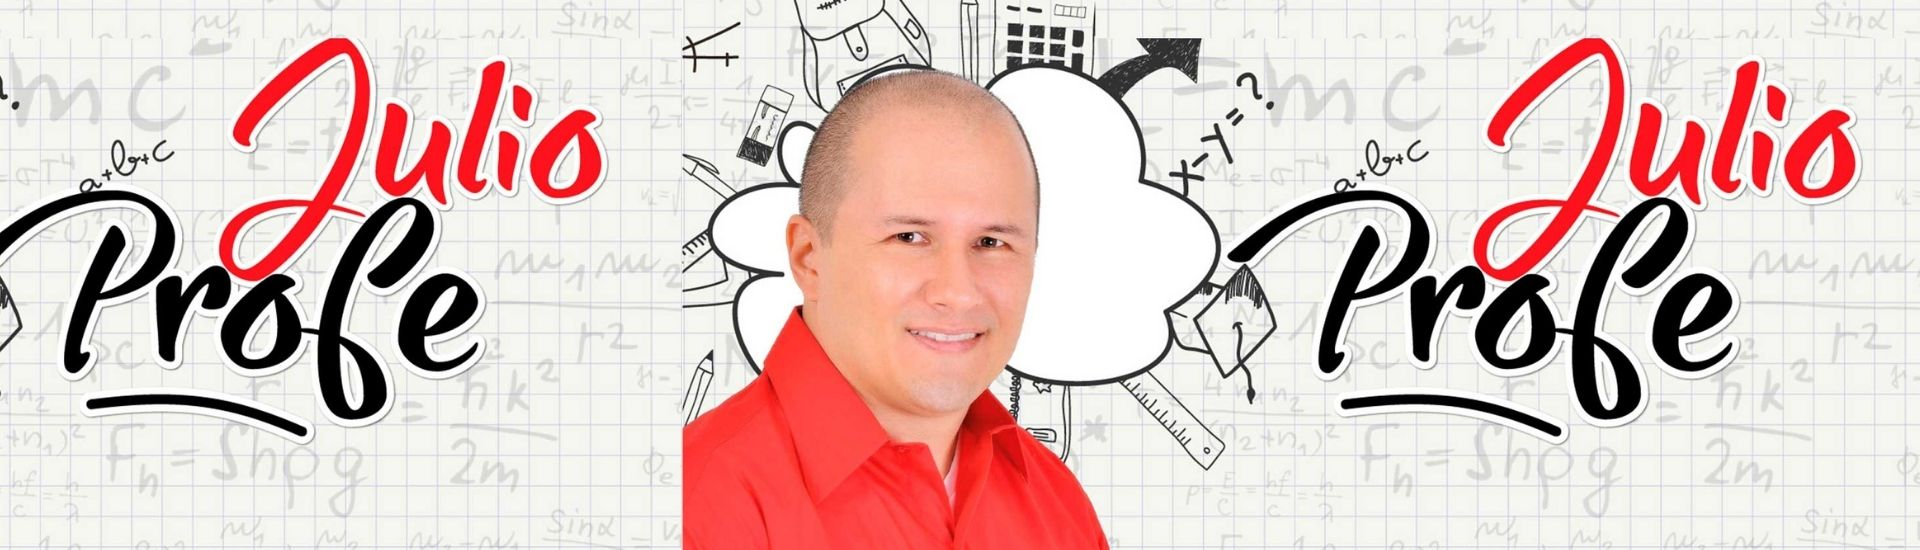 Julio profe-Profesor de matemáticas youtuber